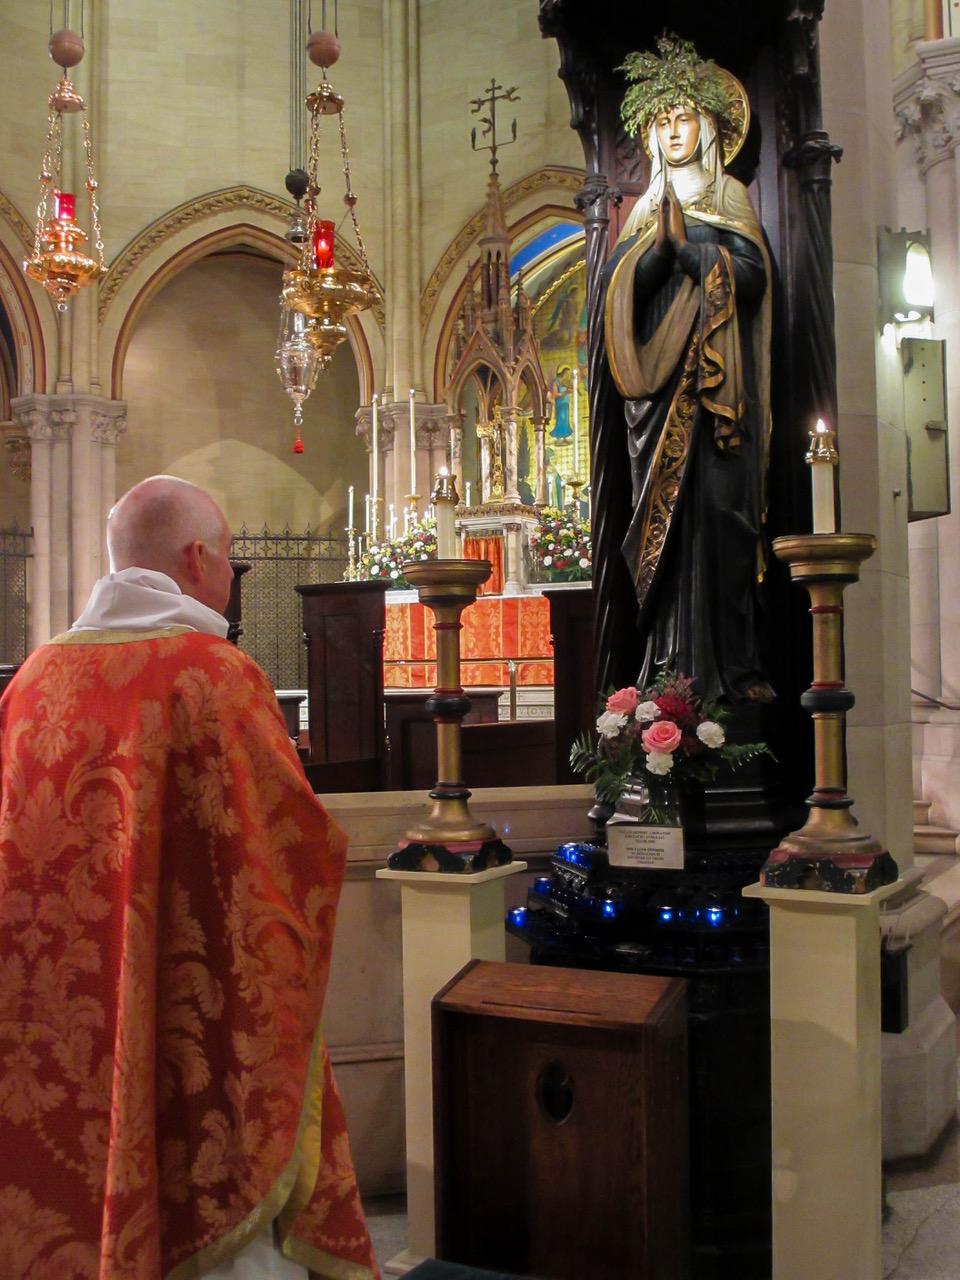 The Eastertide Angelus, Regina Coeli, is prayed before the Holy Eucharist begins.     Photo: MaryJane Boland